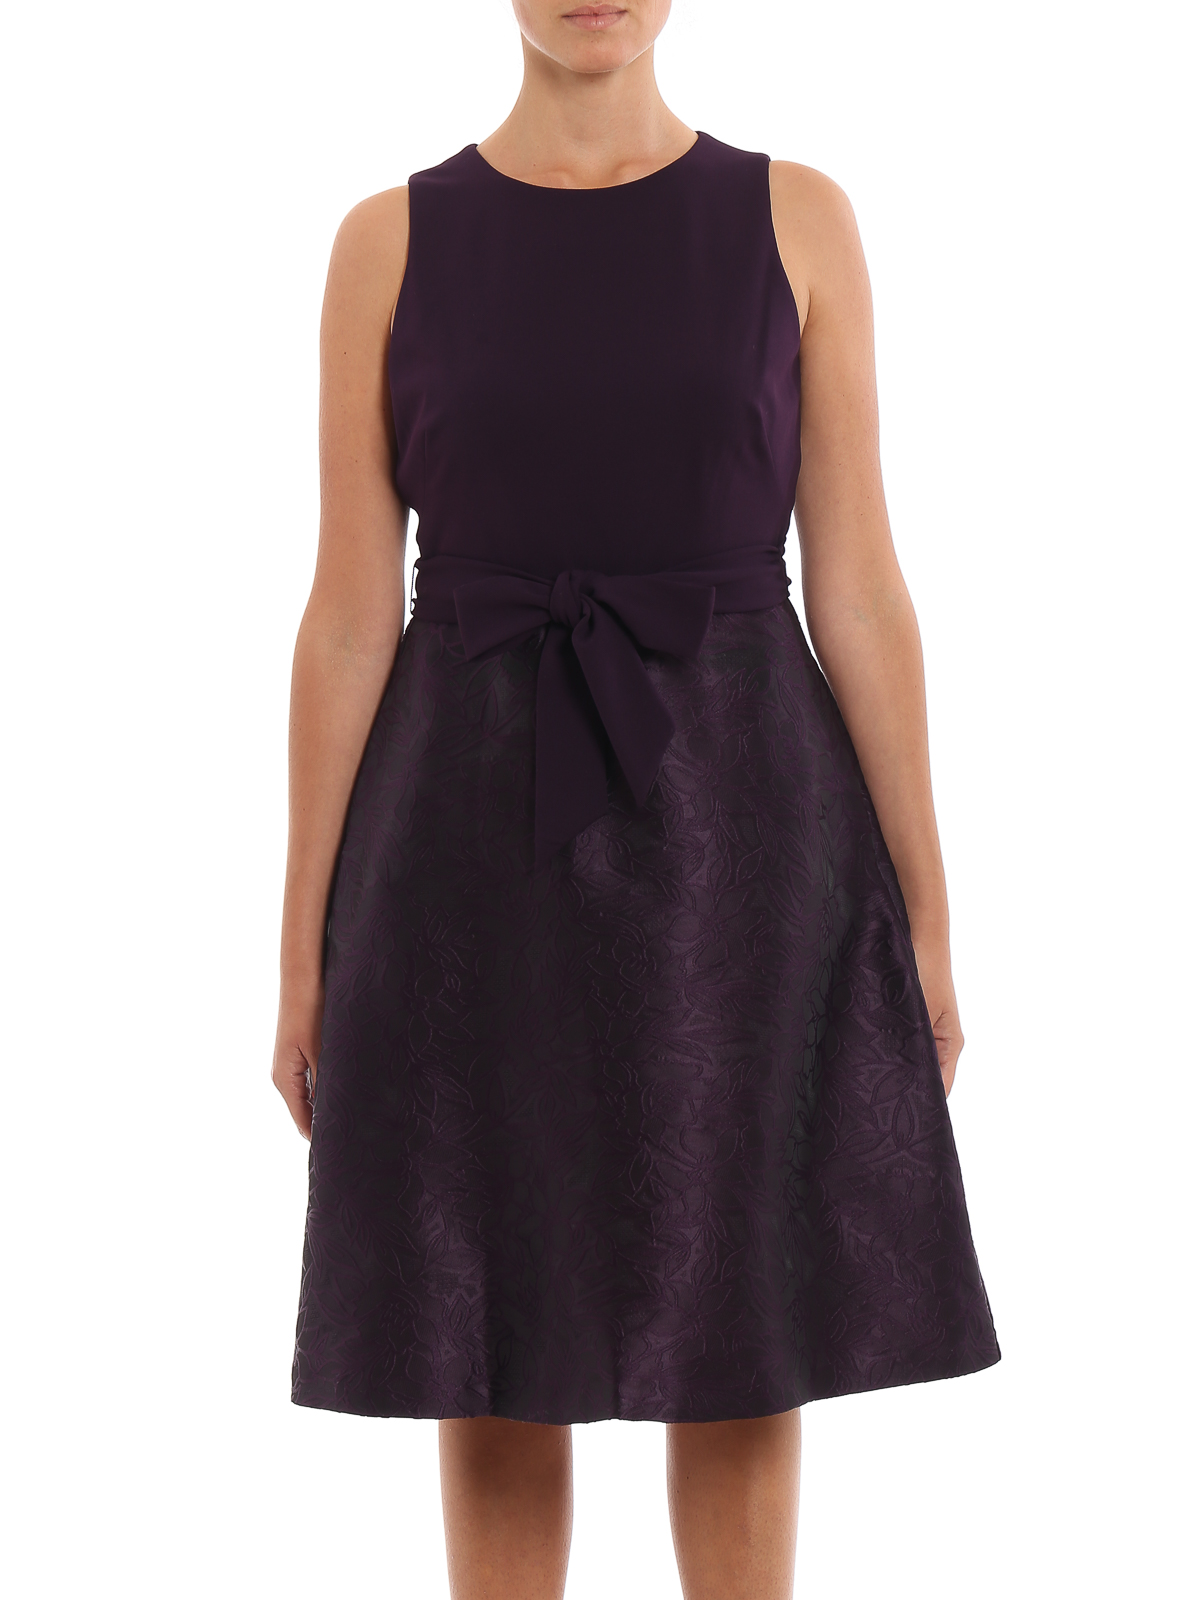 annorah-sleeveless-cocktail dress RALPH LAUREN | 11 | 253756526005RAISIN